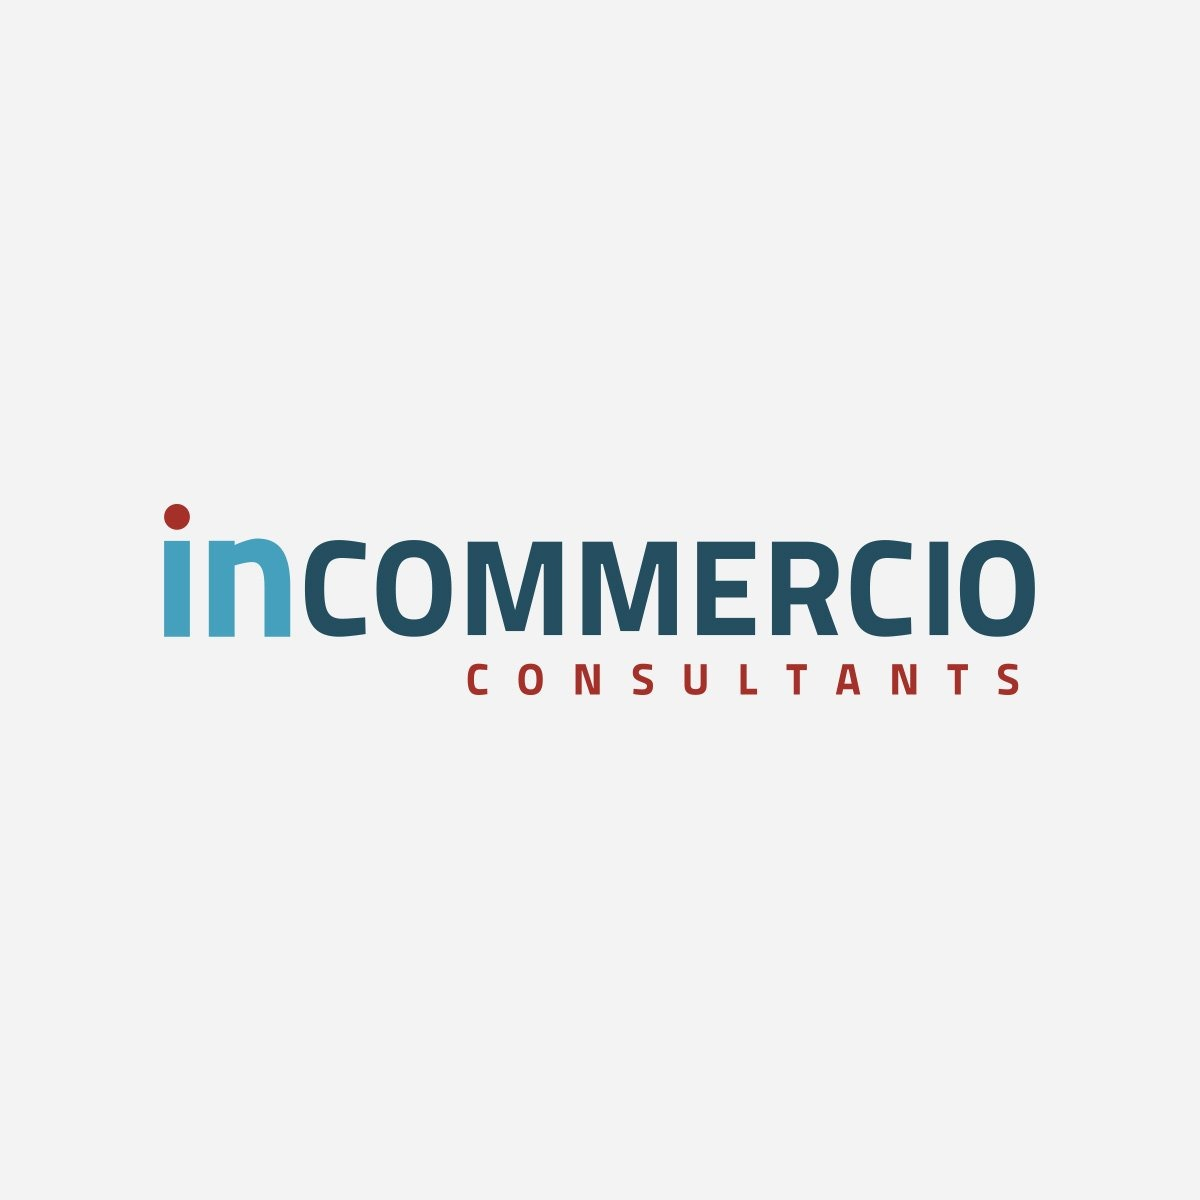 InCommercio Consultants Logo